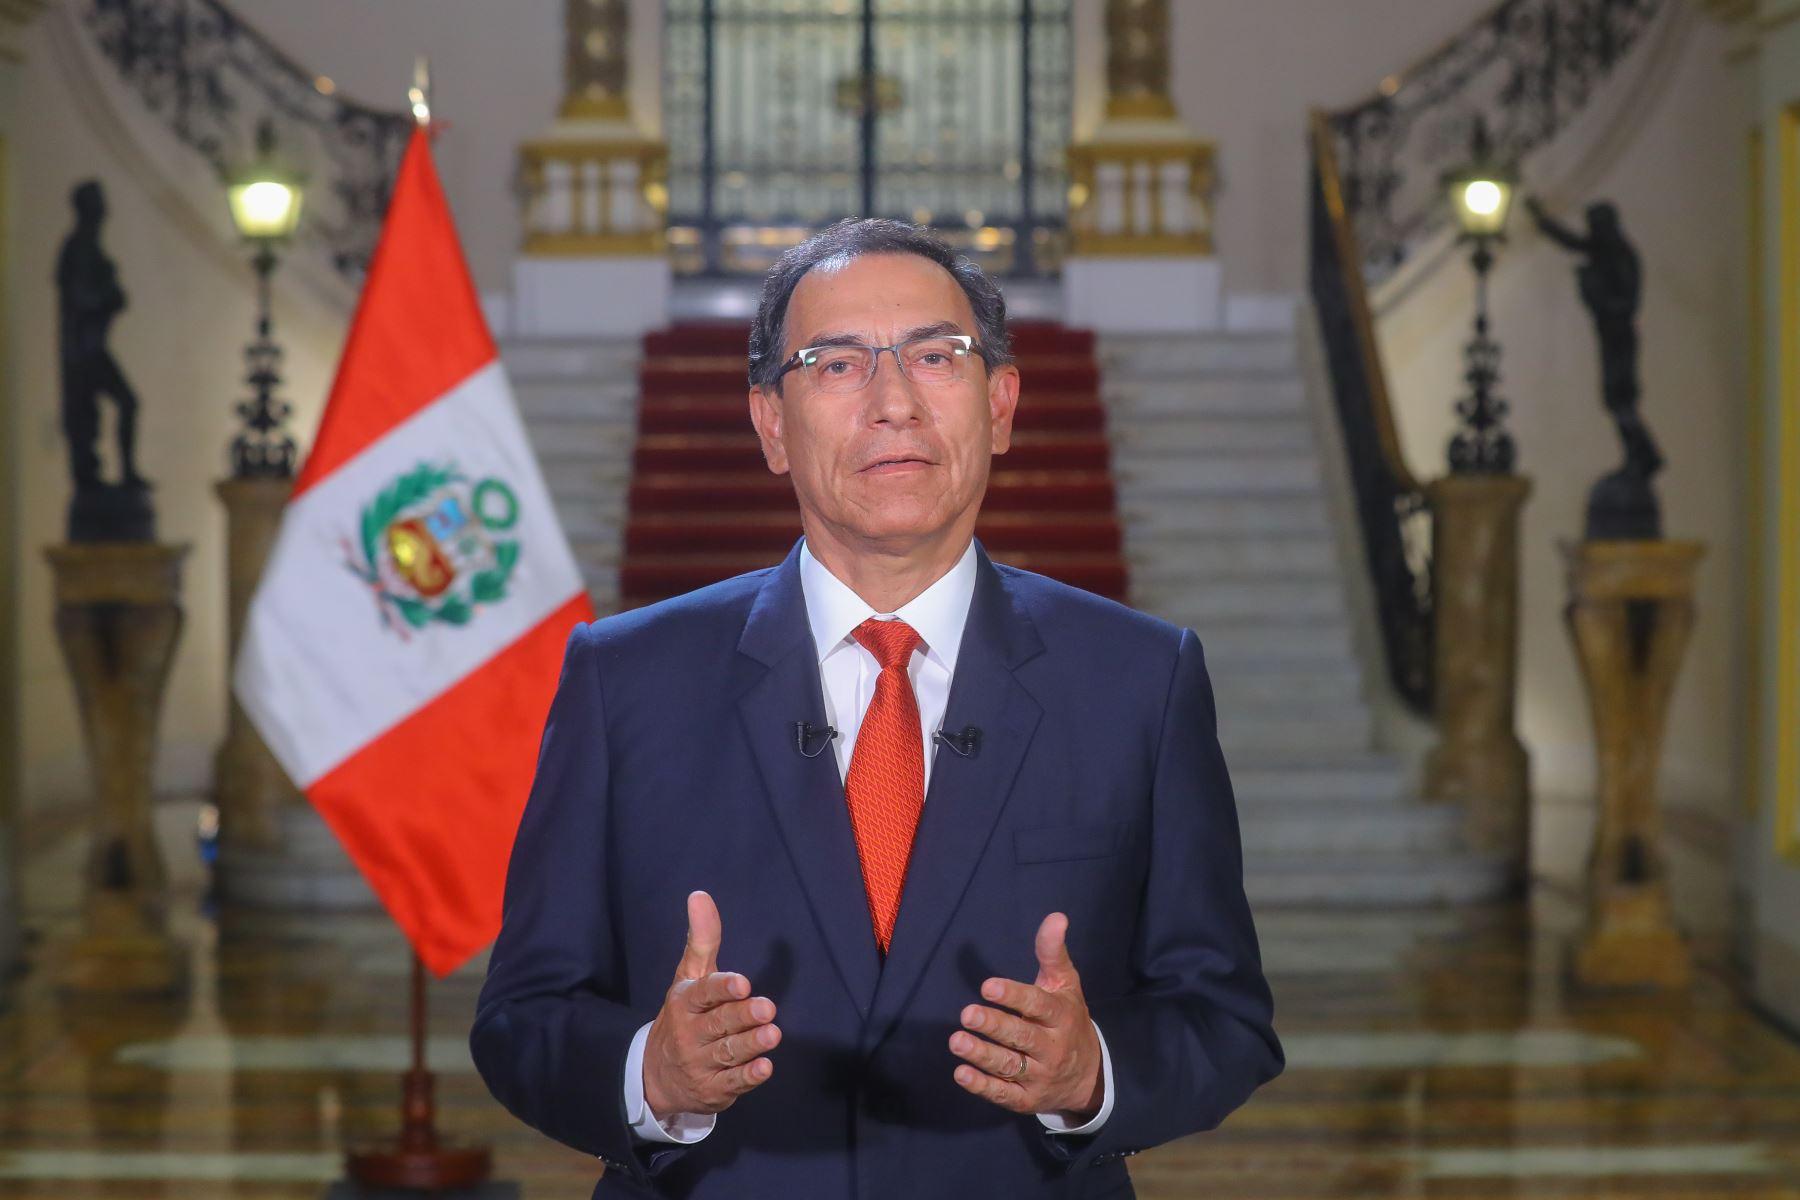 Perú: Congreso autoriza viaje del presidente Vizcarra a Chile